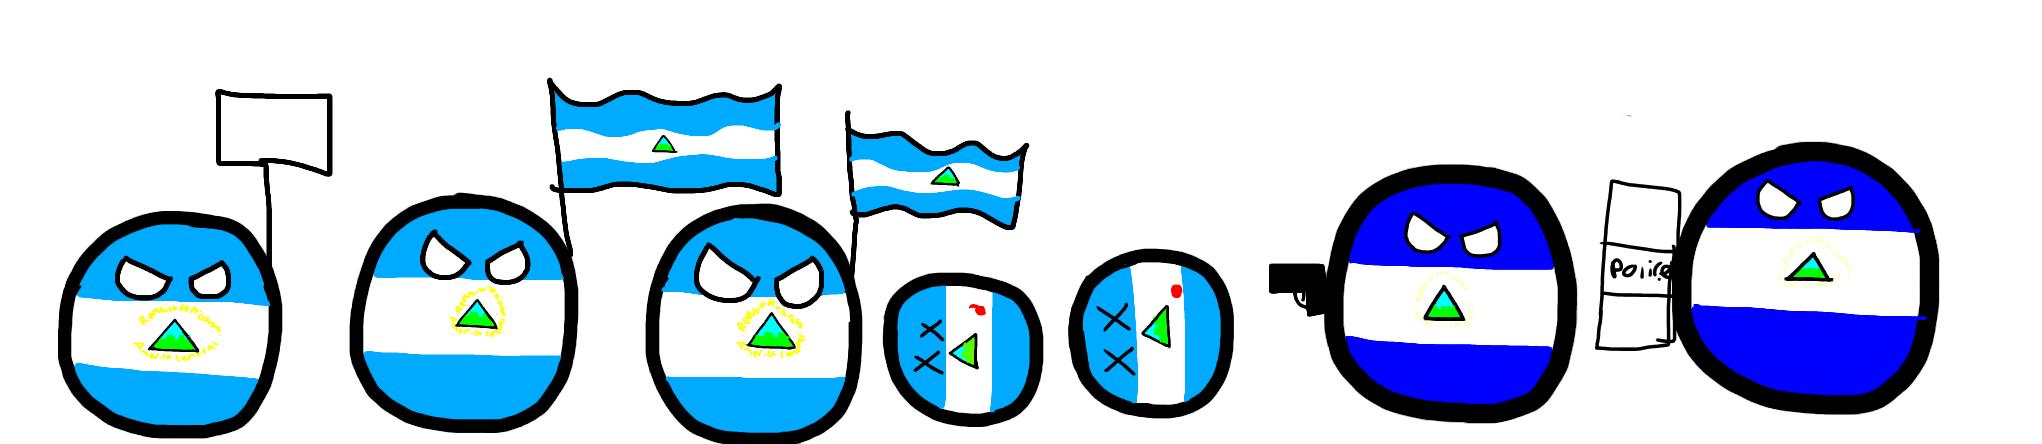 Nicaragua Protests (2018-present)